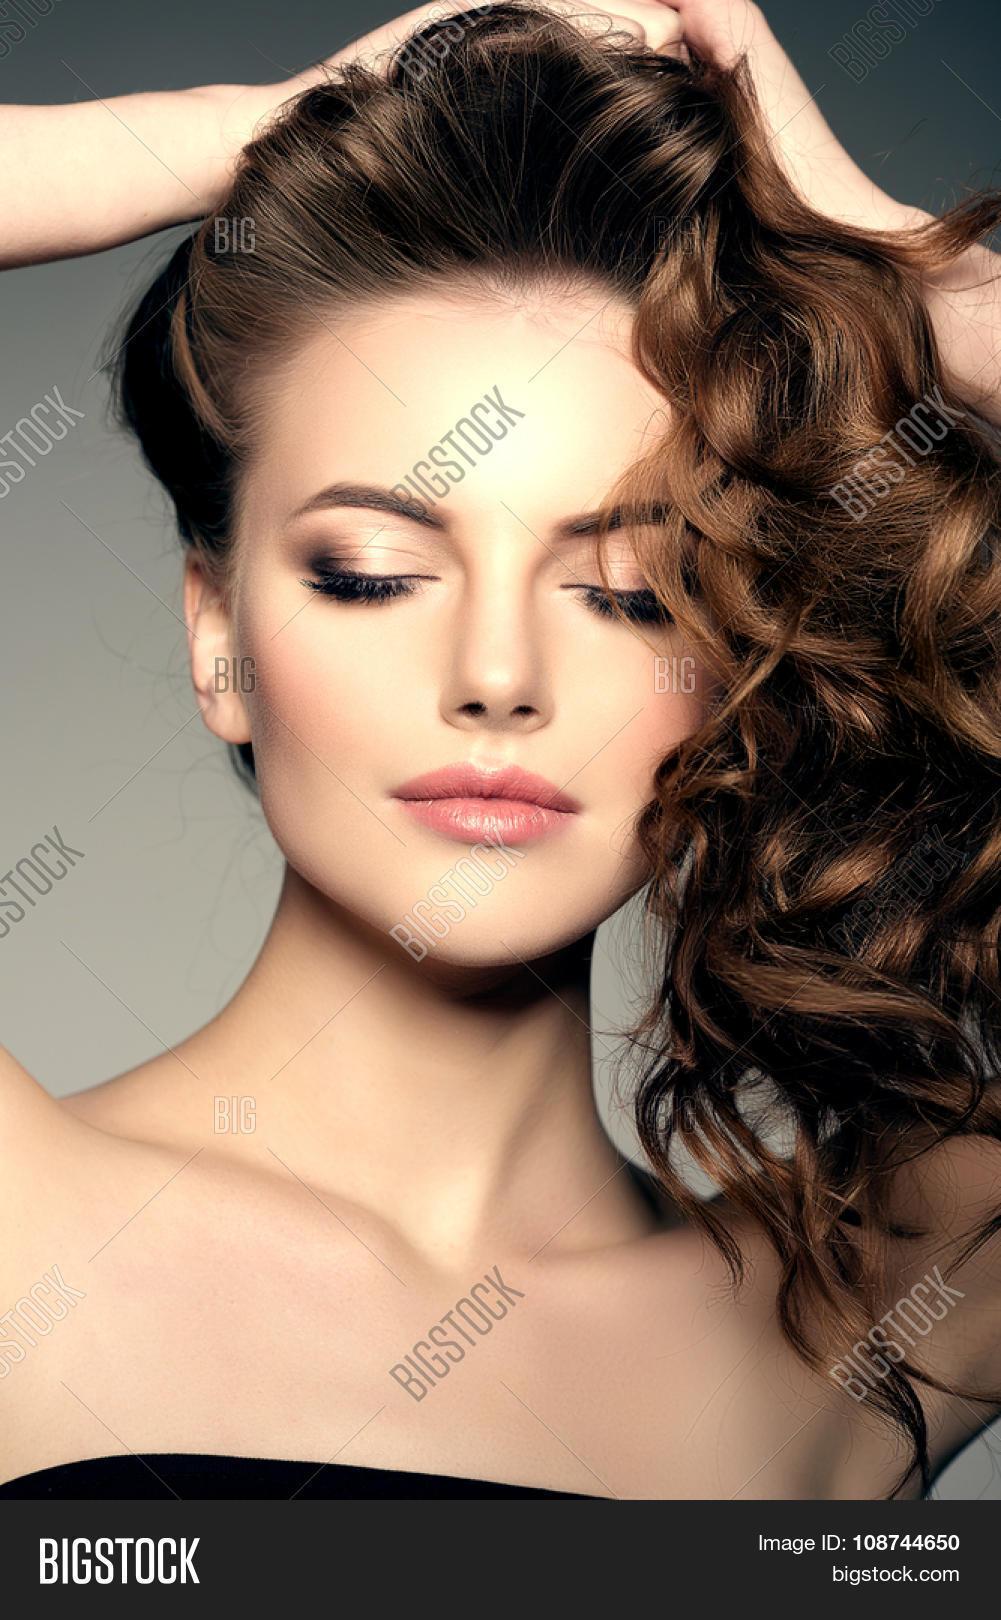 Model Long Hair Waves Curls Image Photo Bigstock - Haircut girl model